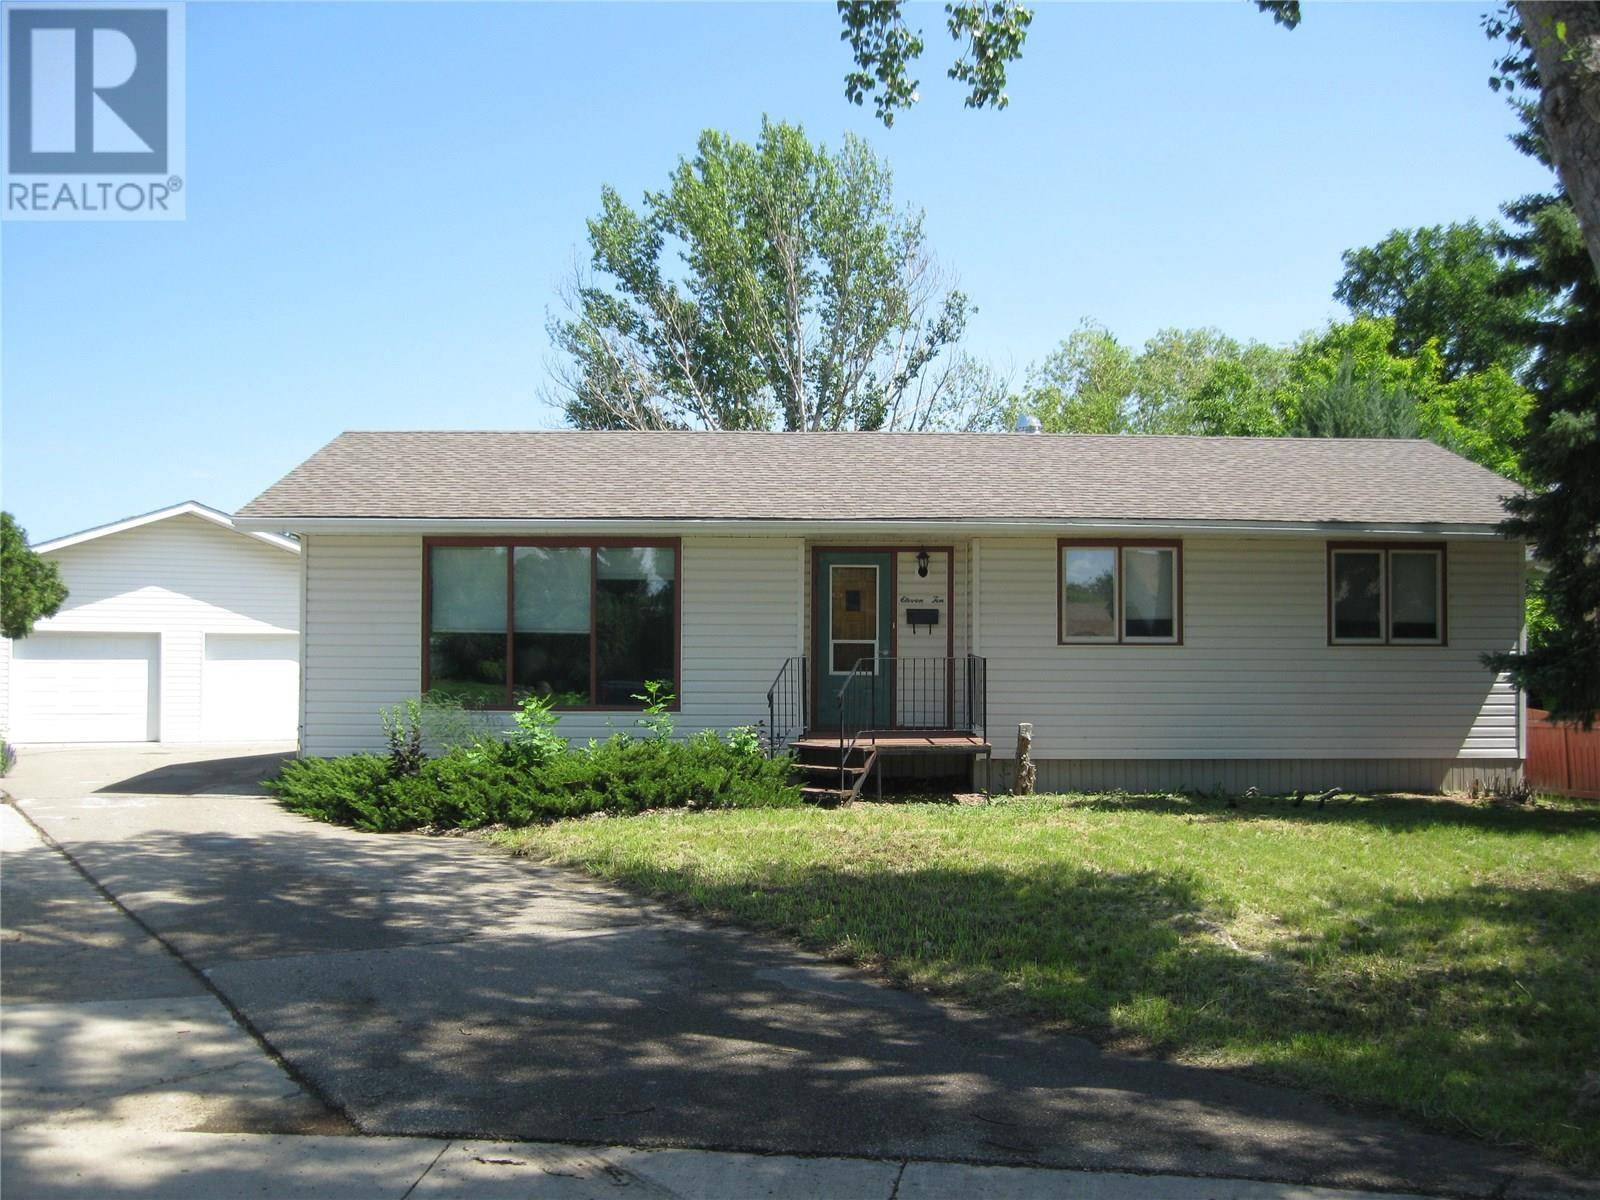 House for sale at 1110 Herschel Pl Rosetown Saskatchewan - MLS: SK781263